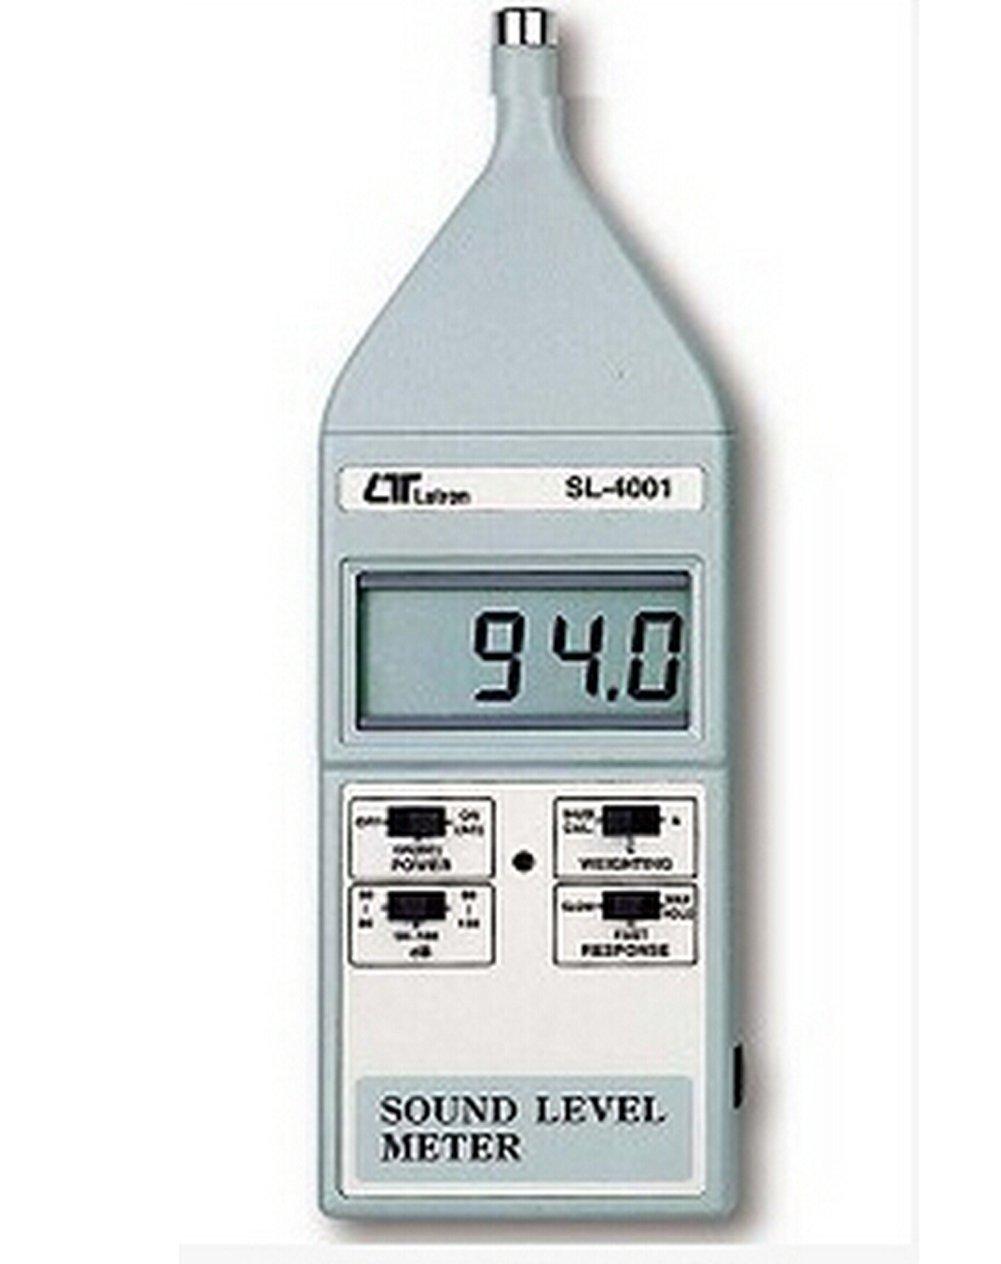 SSEYL SL-4001 Digital Sound Level Meter IEC 651 Type 2 Noise Meter Tester SL4001